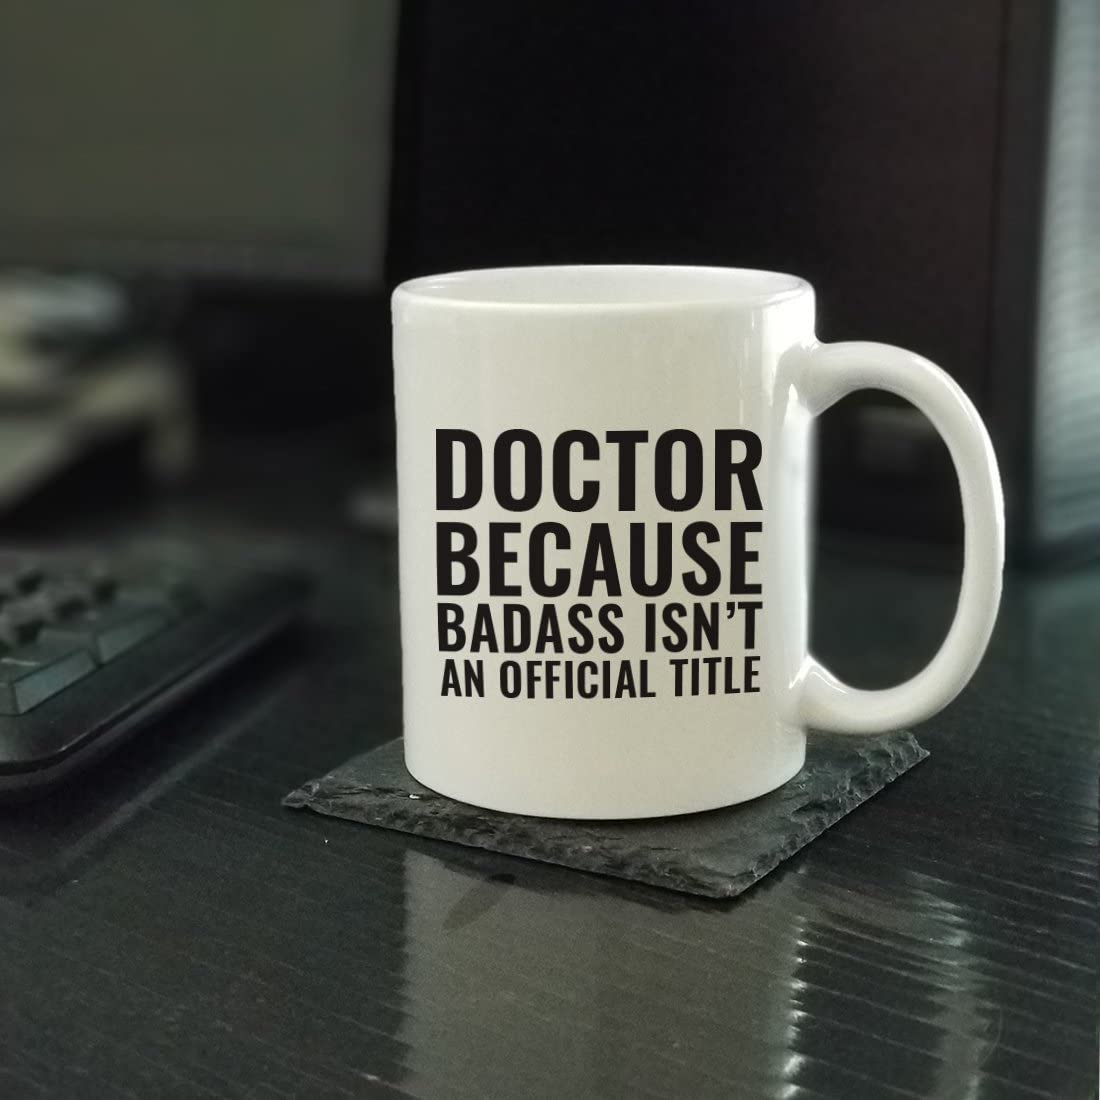 11oz. Coffee Mug Gag Gift, Doctor Because Badass Isn't an Official Title, 1-Pack, Funny Witty Coffee Cup Birthday Christmas Present Ideas Coffee Mug